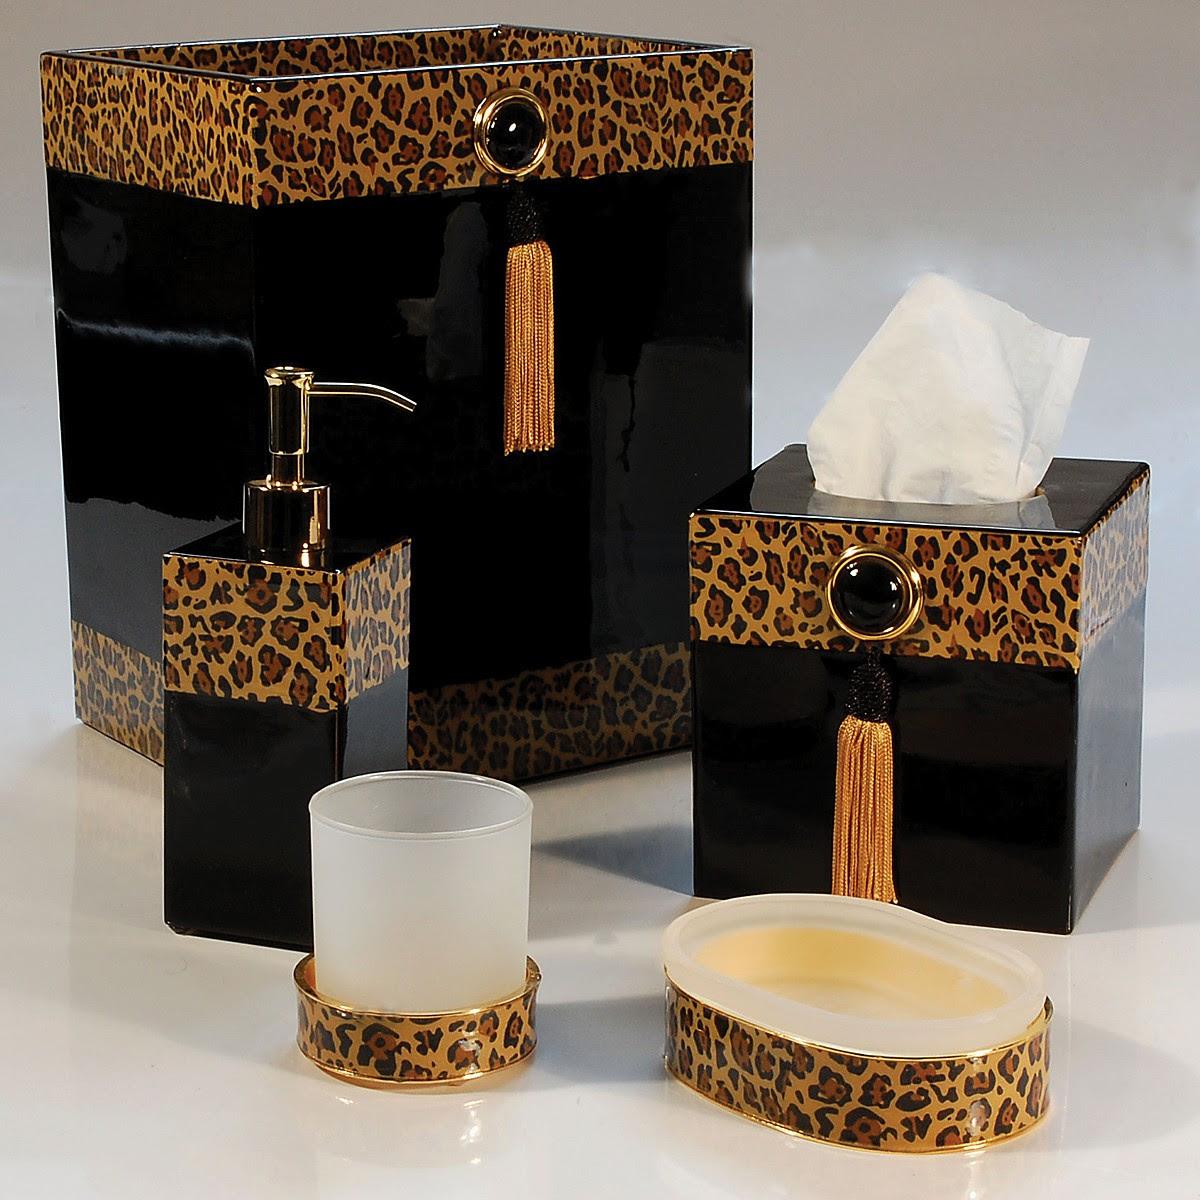 Leopard Bathroom Decor - Bathroom decorations - Animal ...